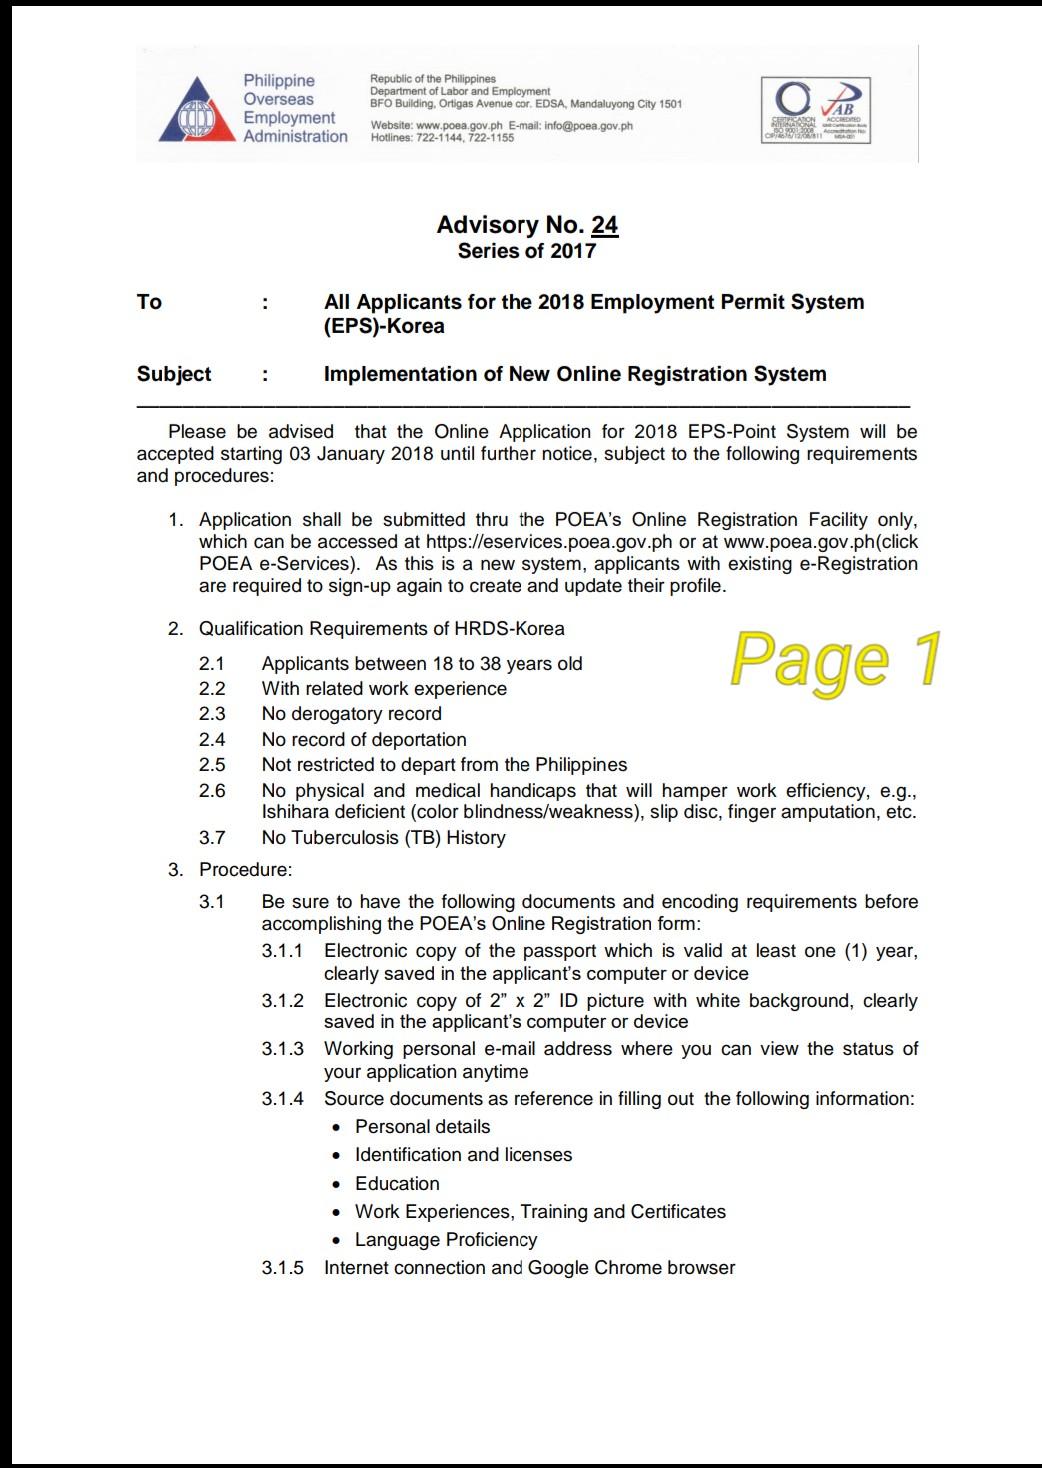 new on line registration system for eps workers in 2018 by poea rh pinoyseoul com EPS-TOPIK HRD Korea Kr EPS- KLT Result